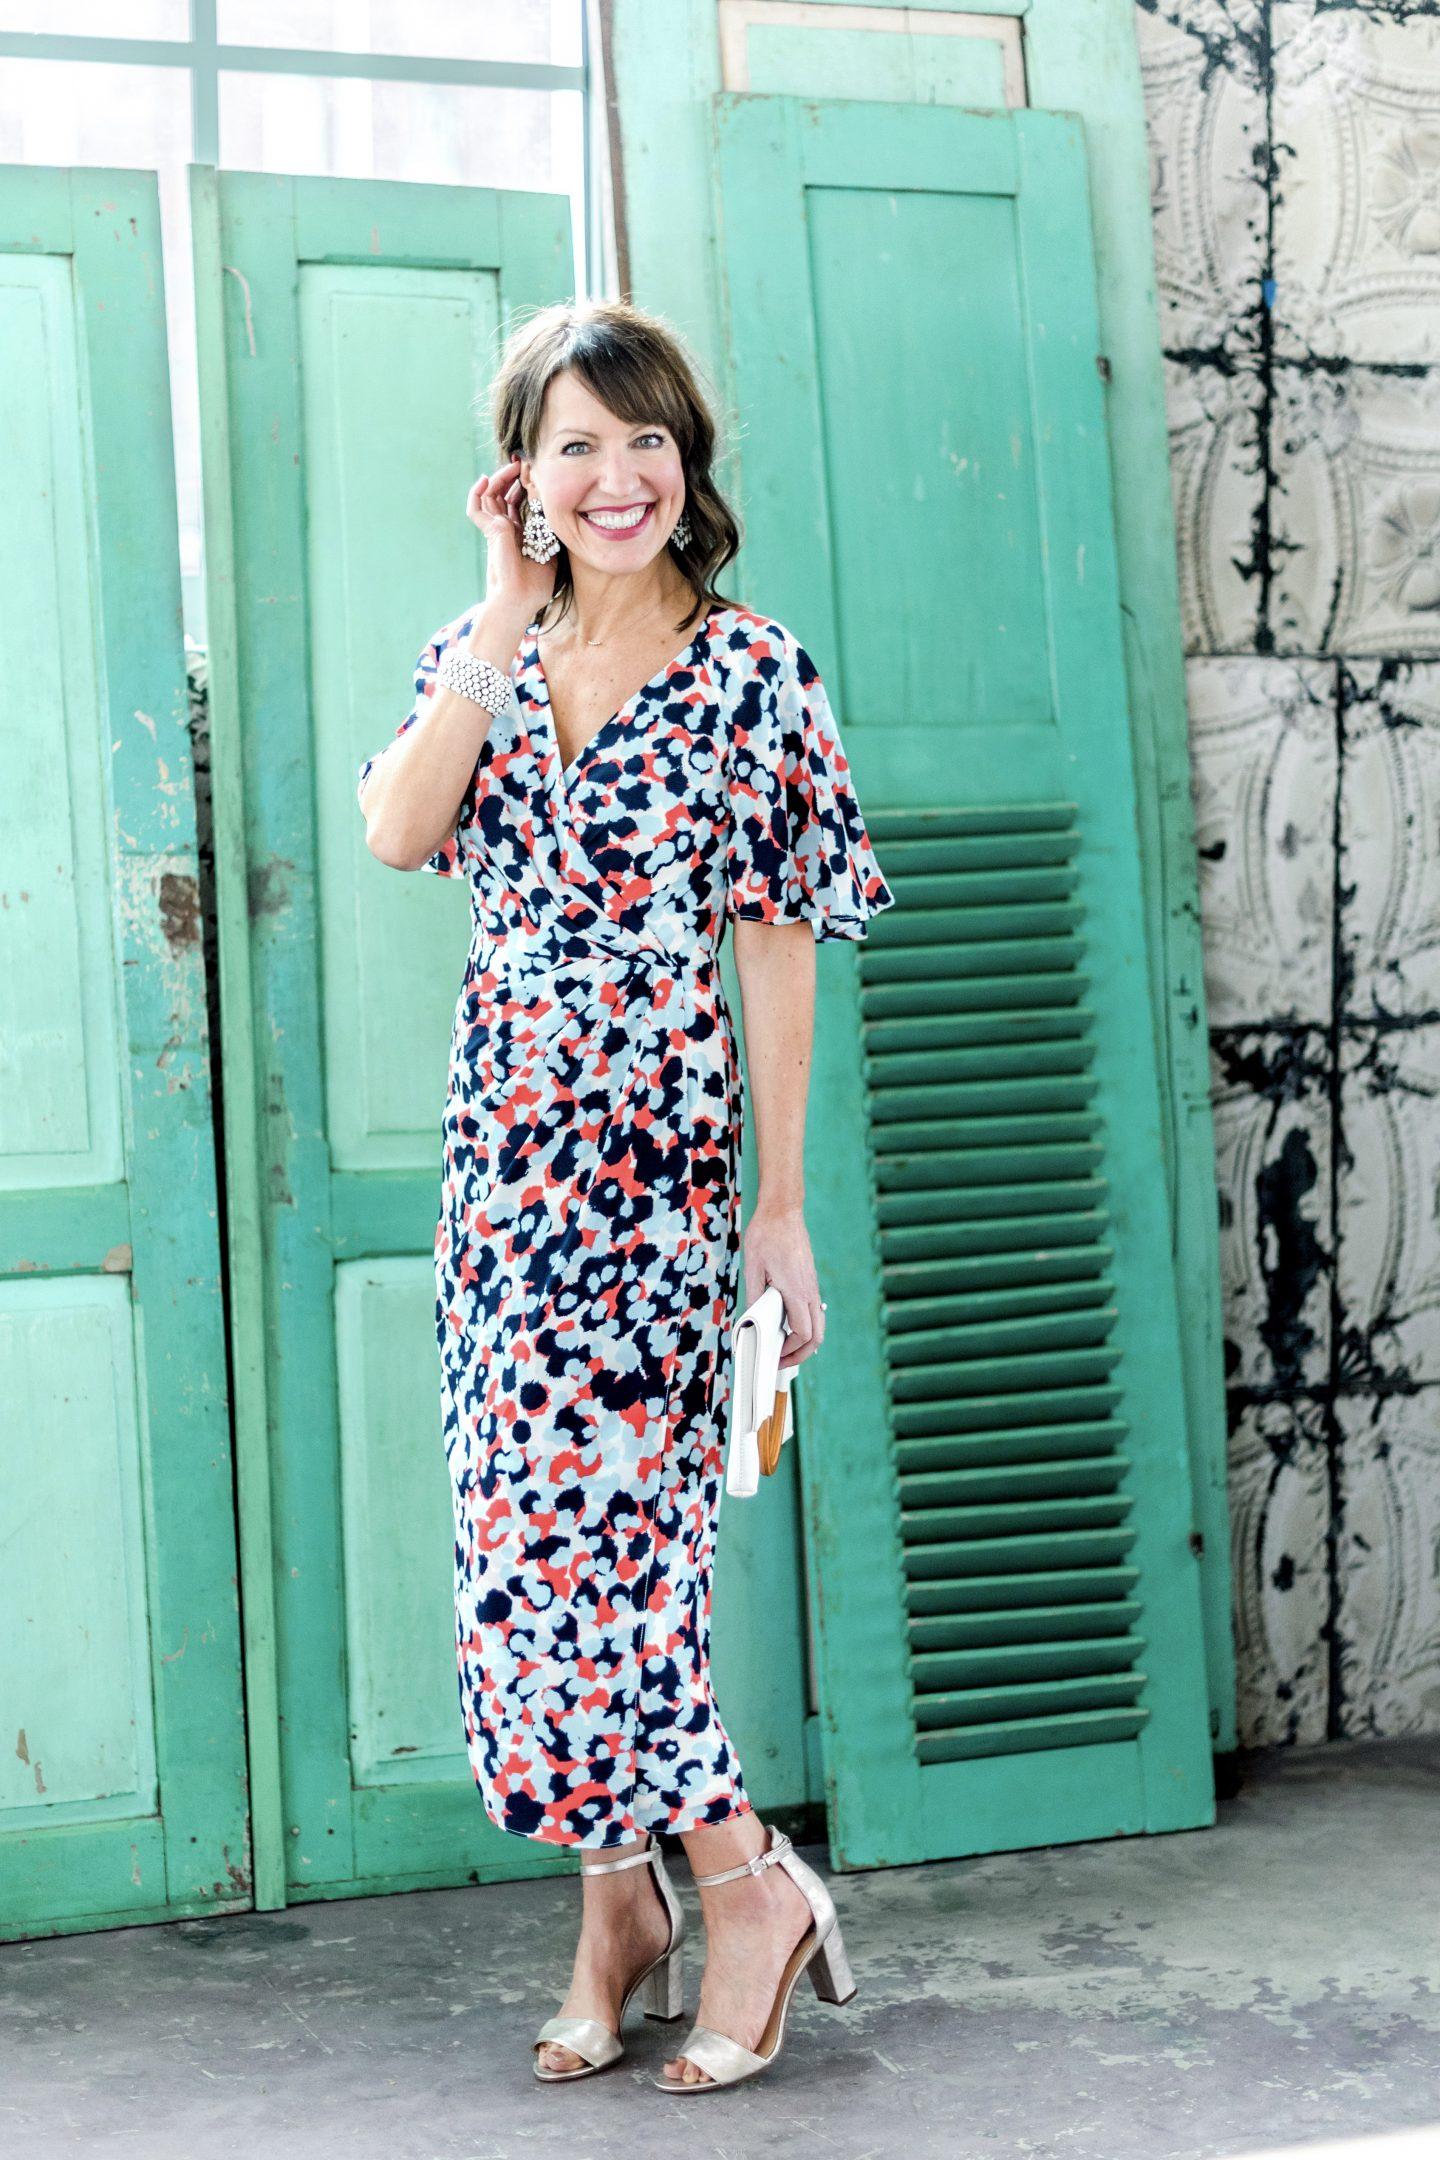 midi length patterned dress